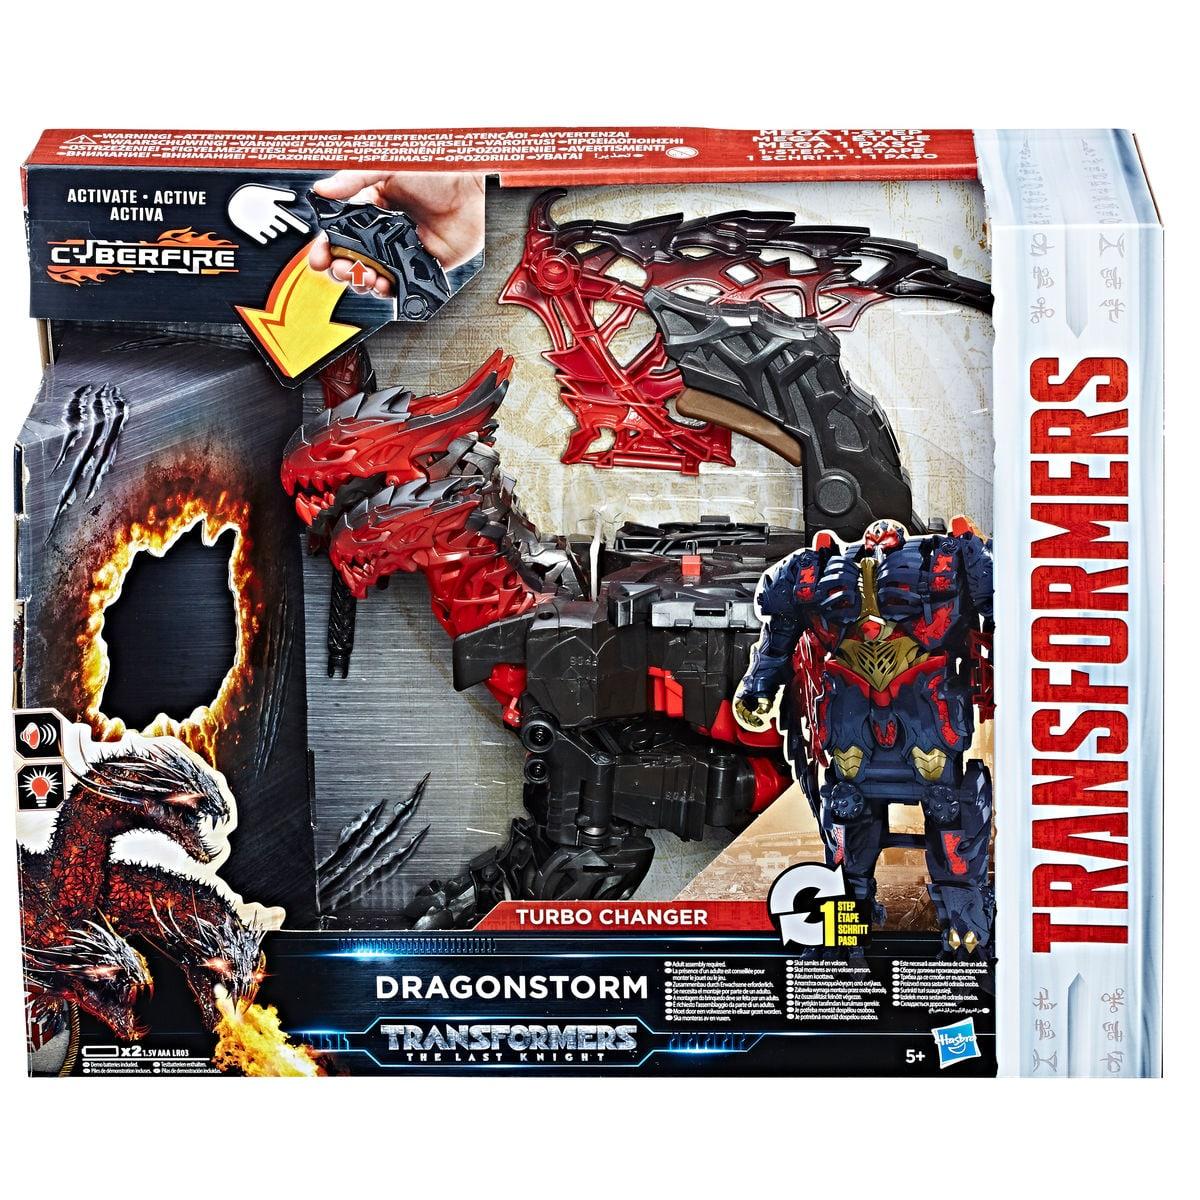 Transformers movie mega turbo changer dragonstorm migros